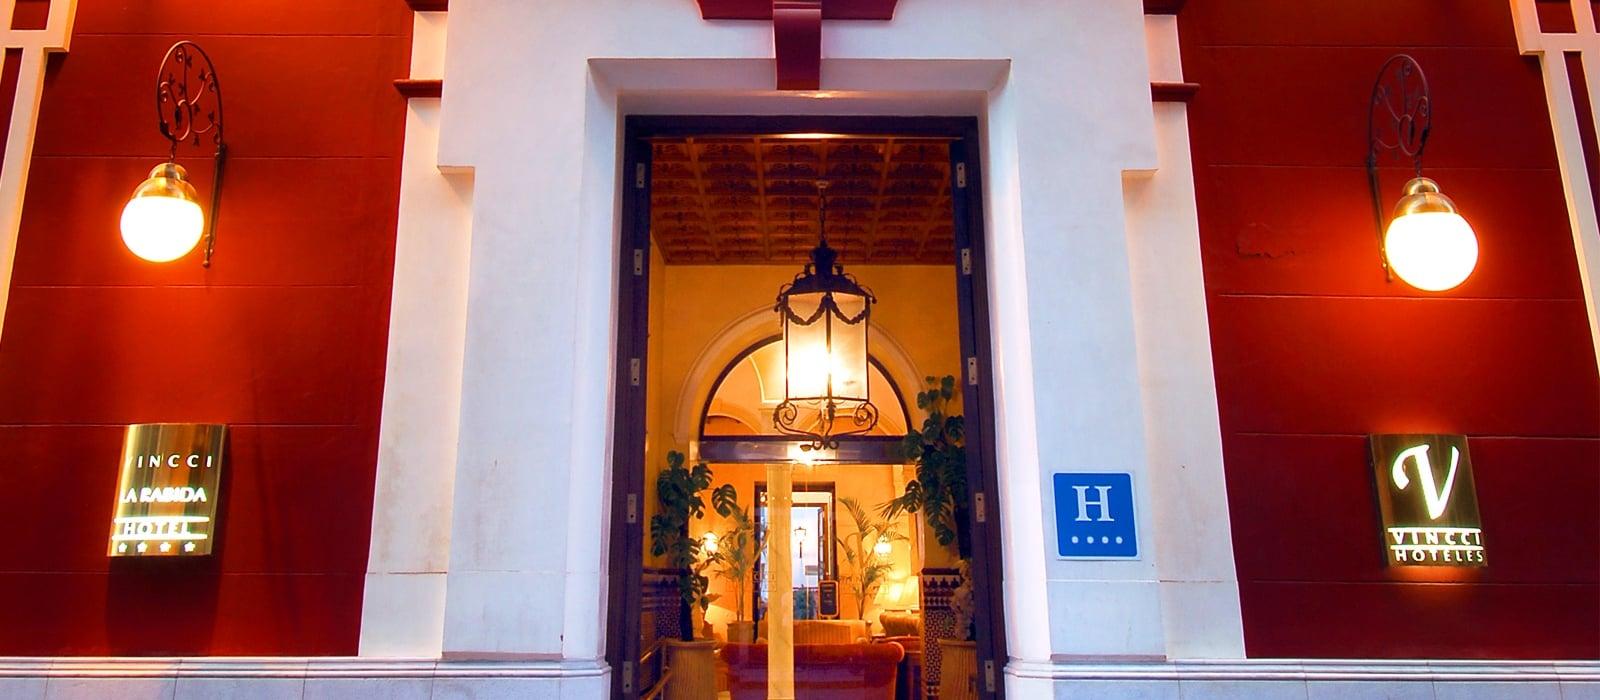 Detailansicht Fassade - Vincci La Rábida 4*